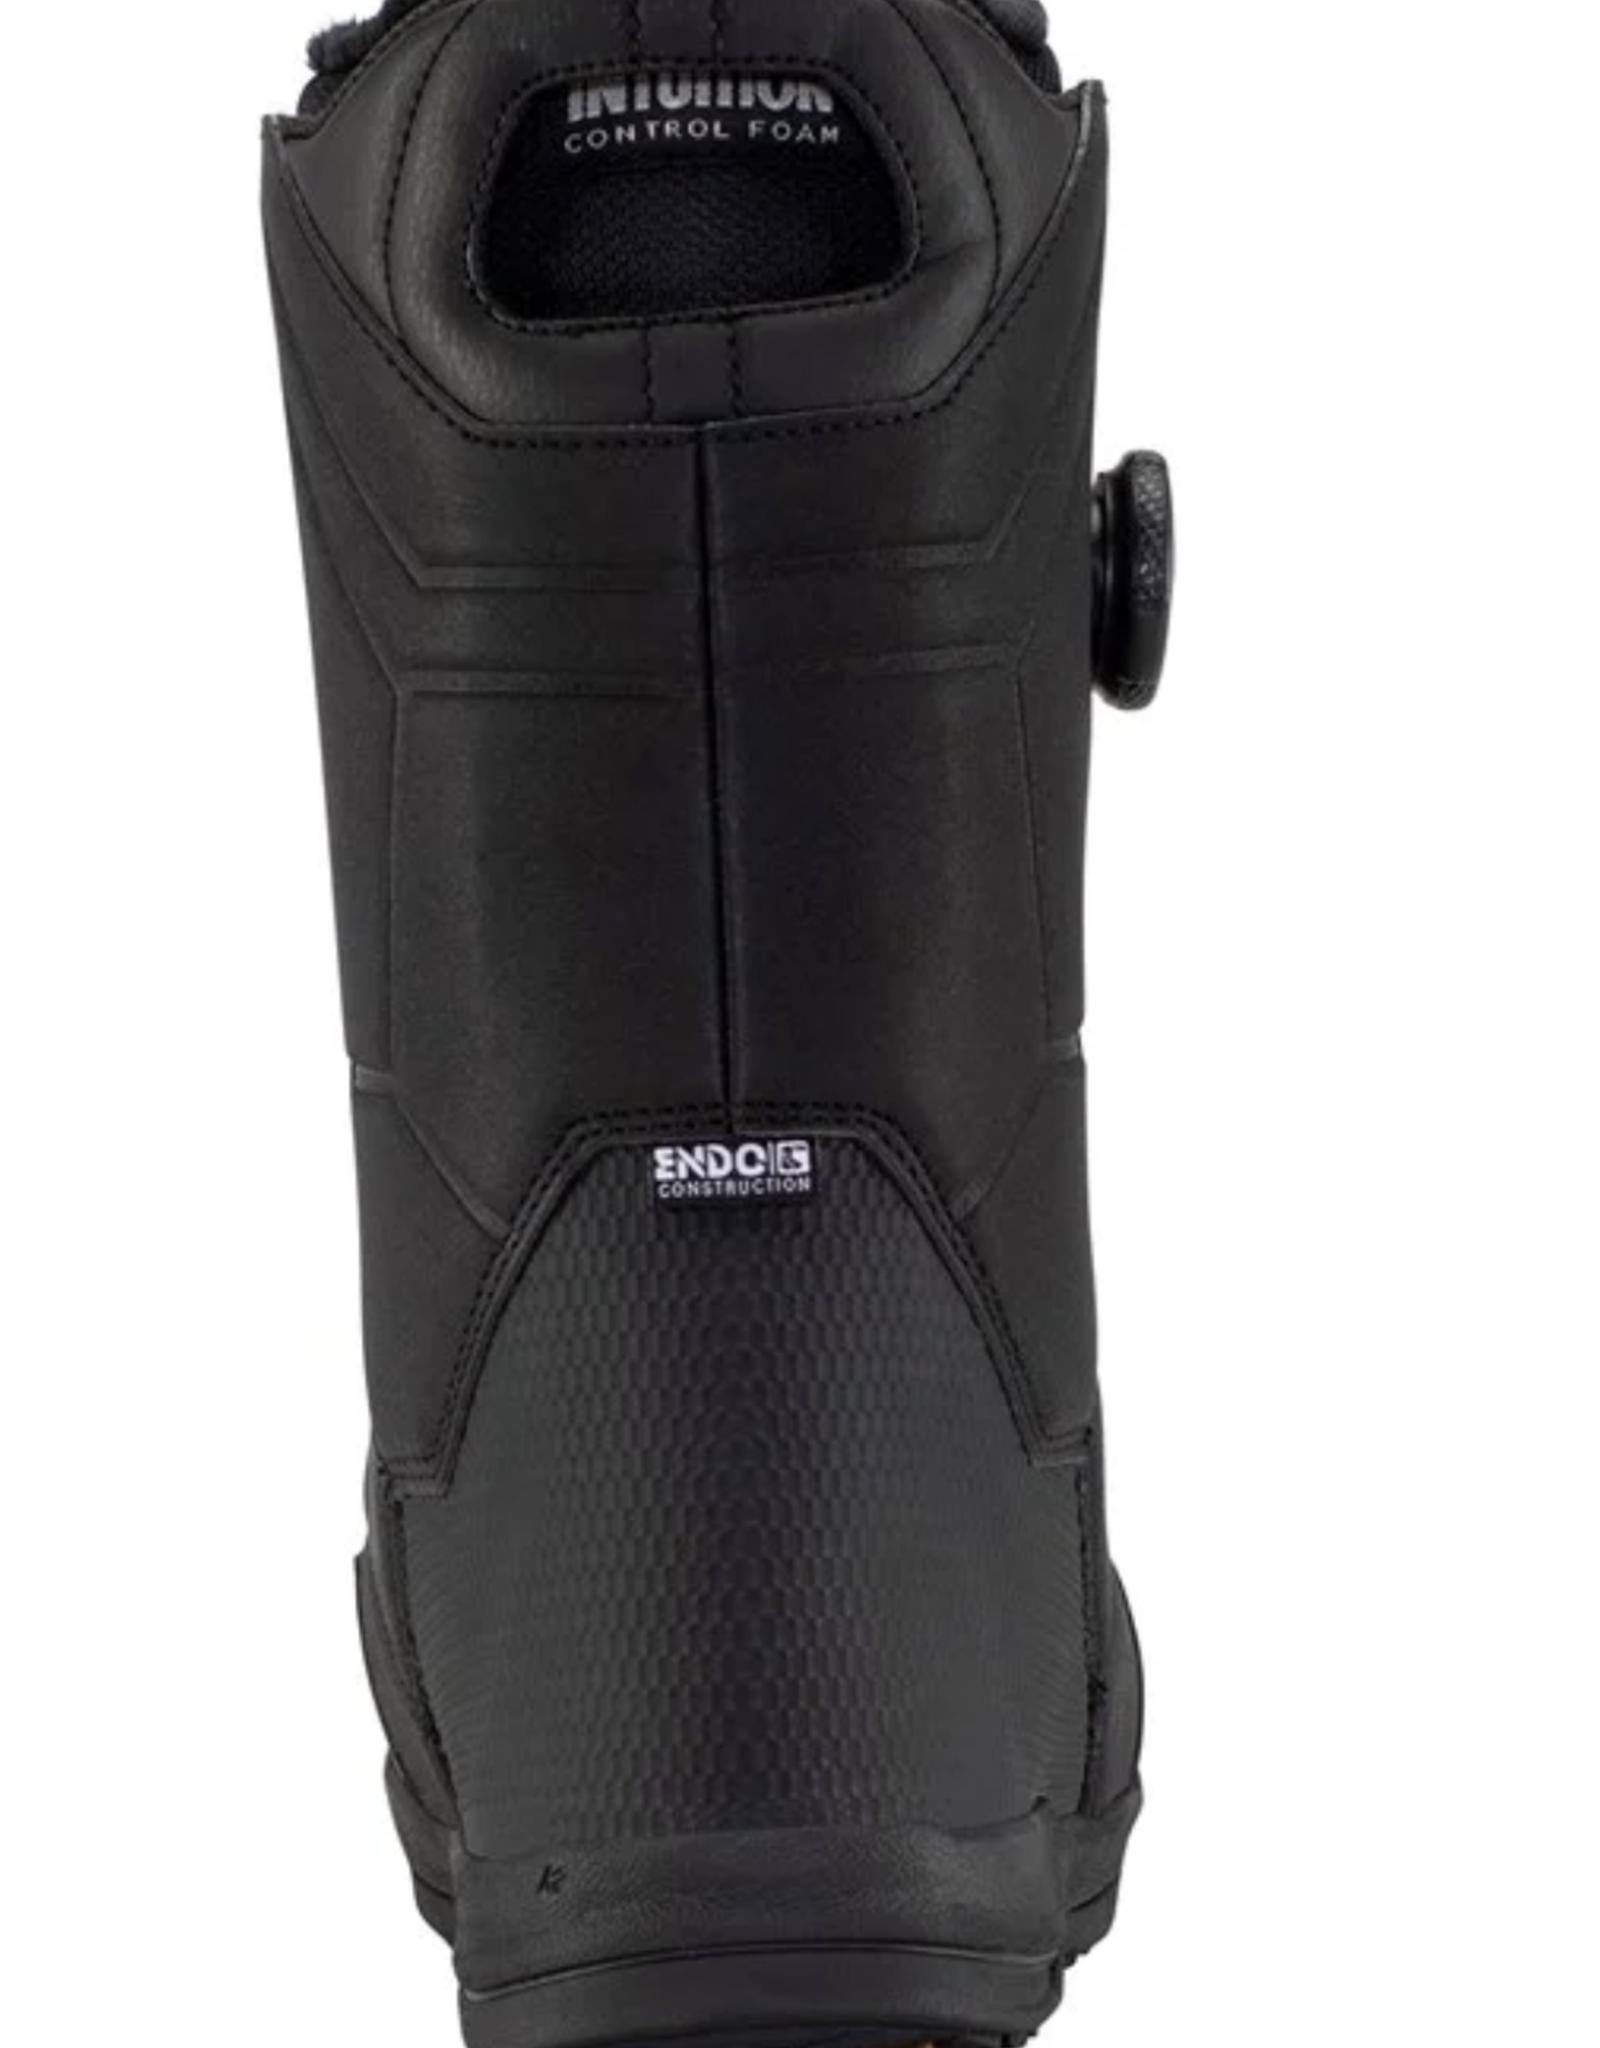 K2 Men's Maysis Snowboard Boots 2022